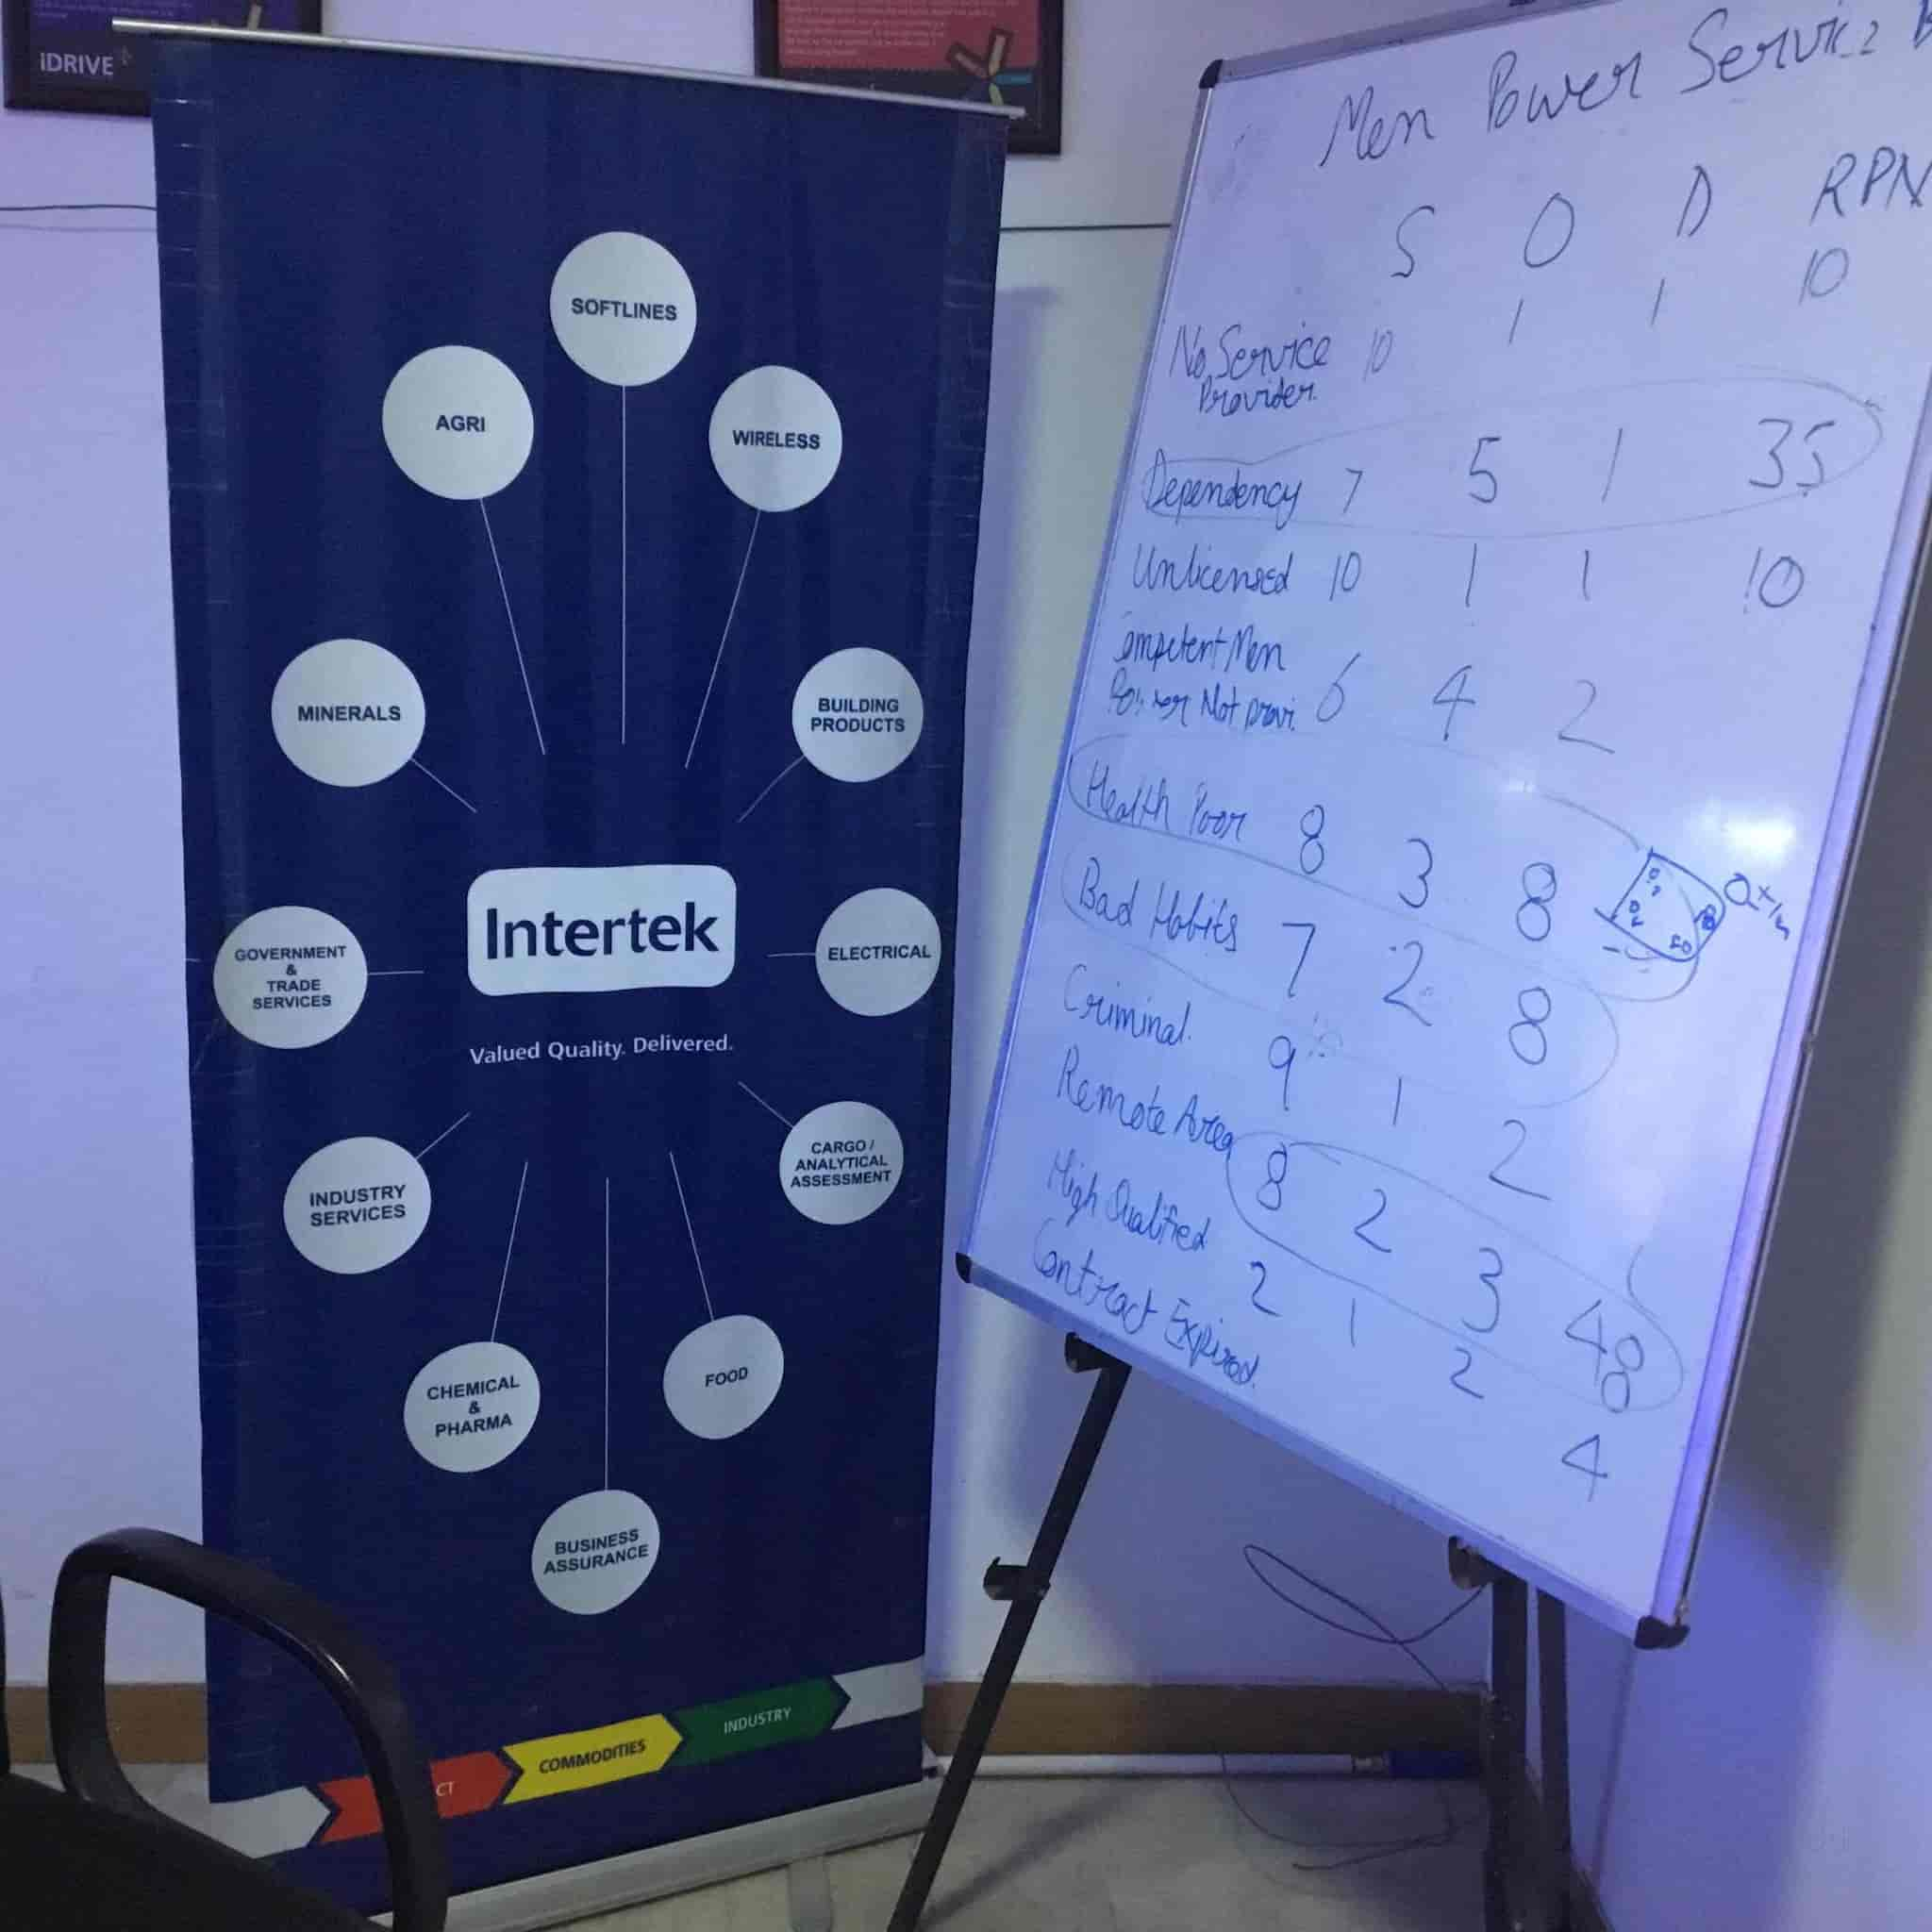 Intertek, Opposite Bus Stand - Internal Auditors in